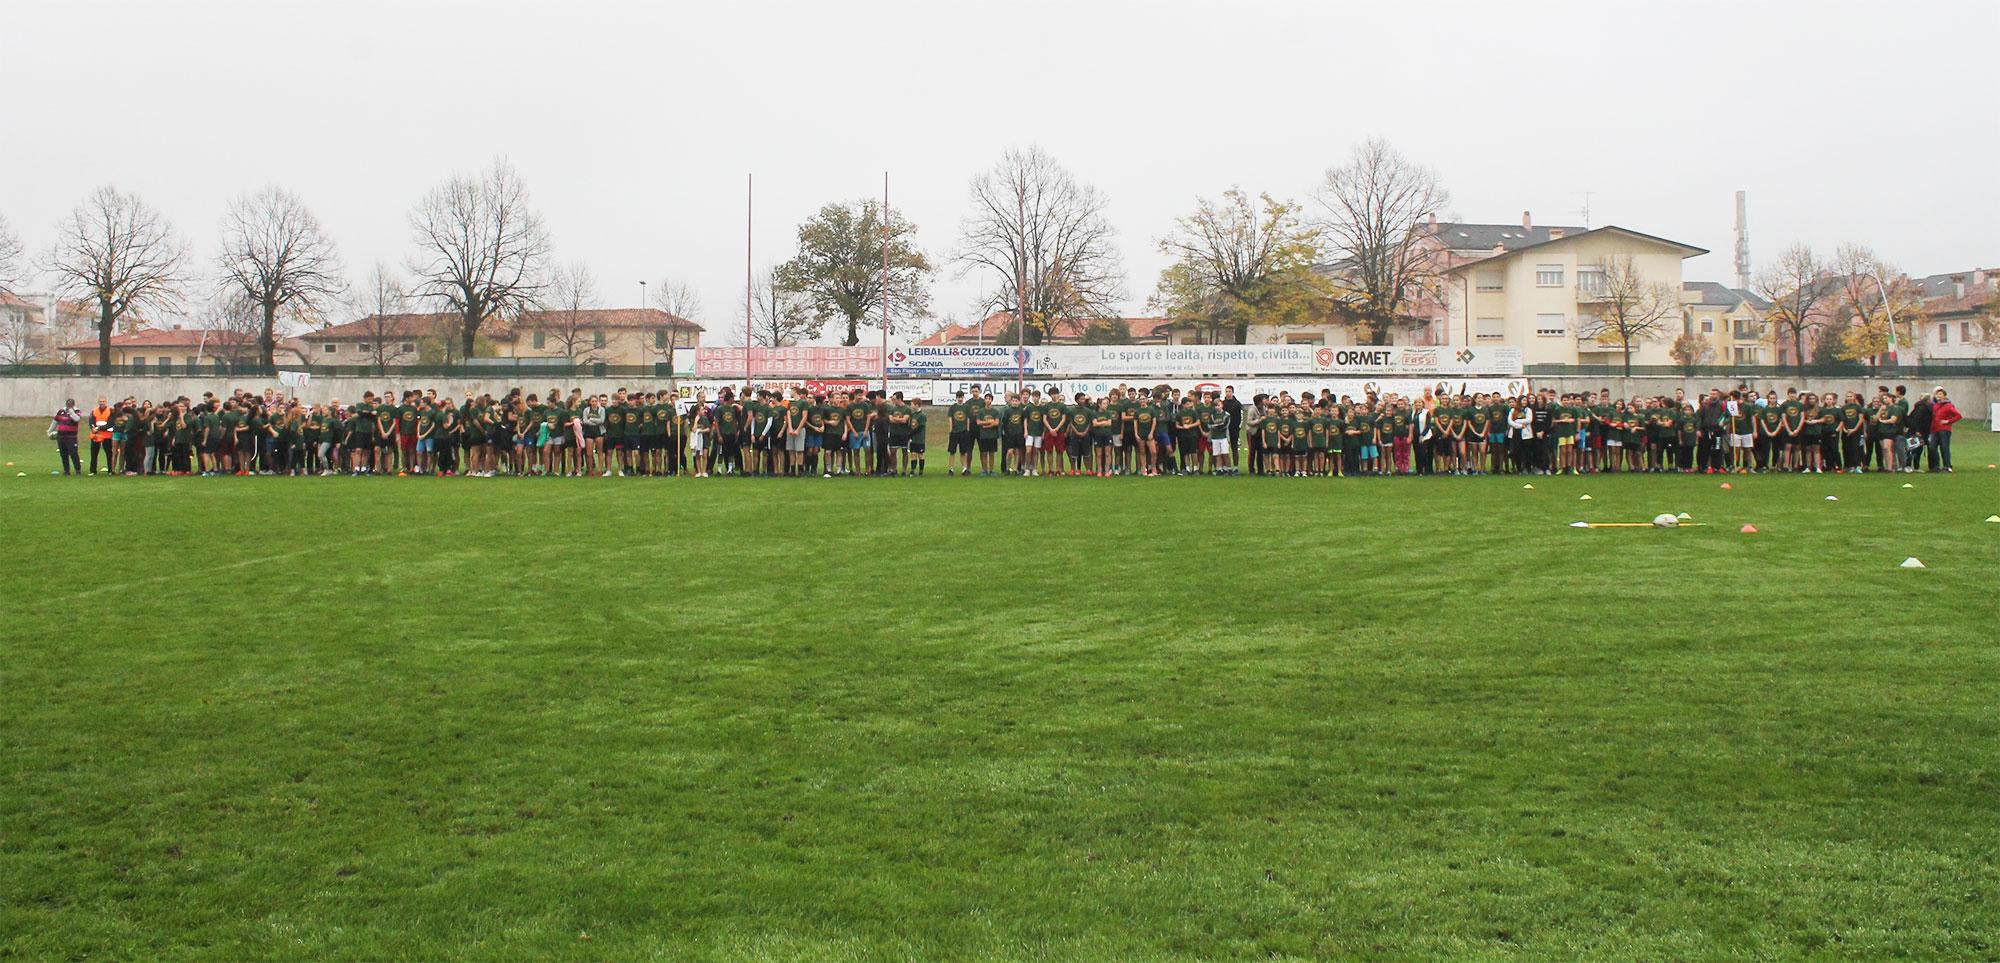 http://rugbyvittorioveneto.it/wp-content/uploads/2018/12/chi-siamo.jpg